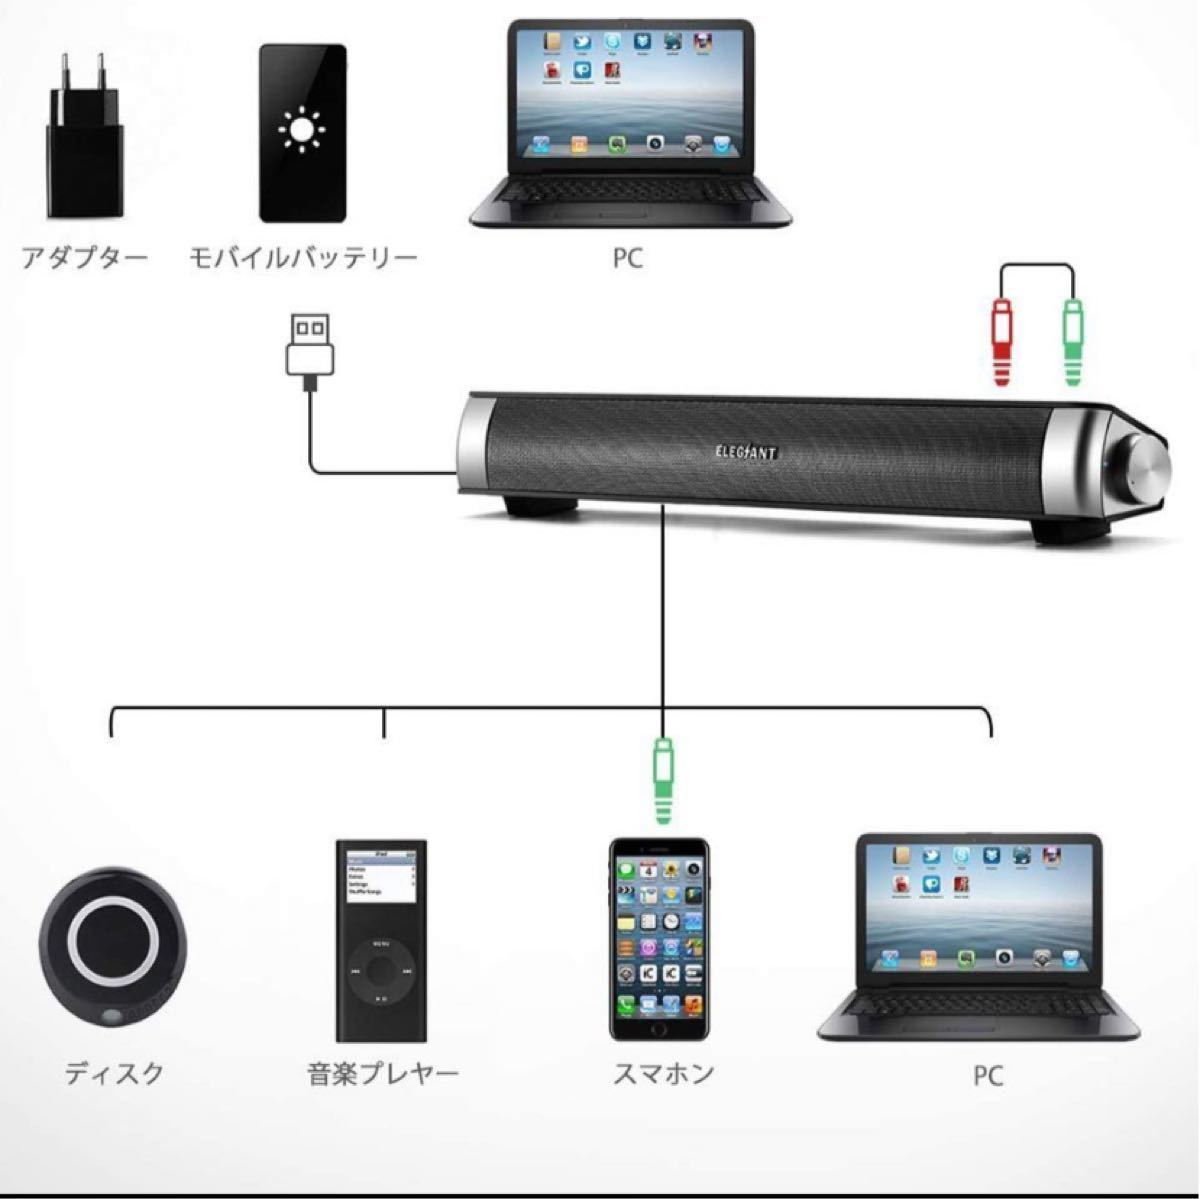 PCスピーカー USB パソコン サウンドバー ステレオ有線給電 小型 大音量